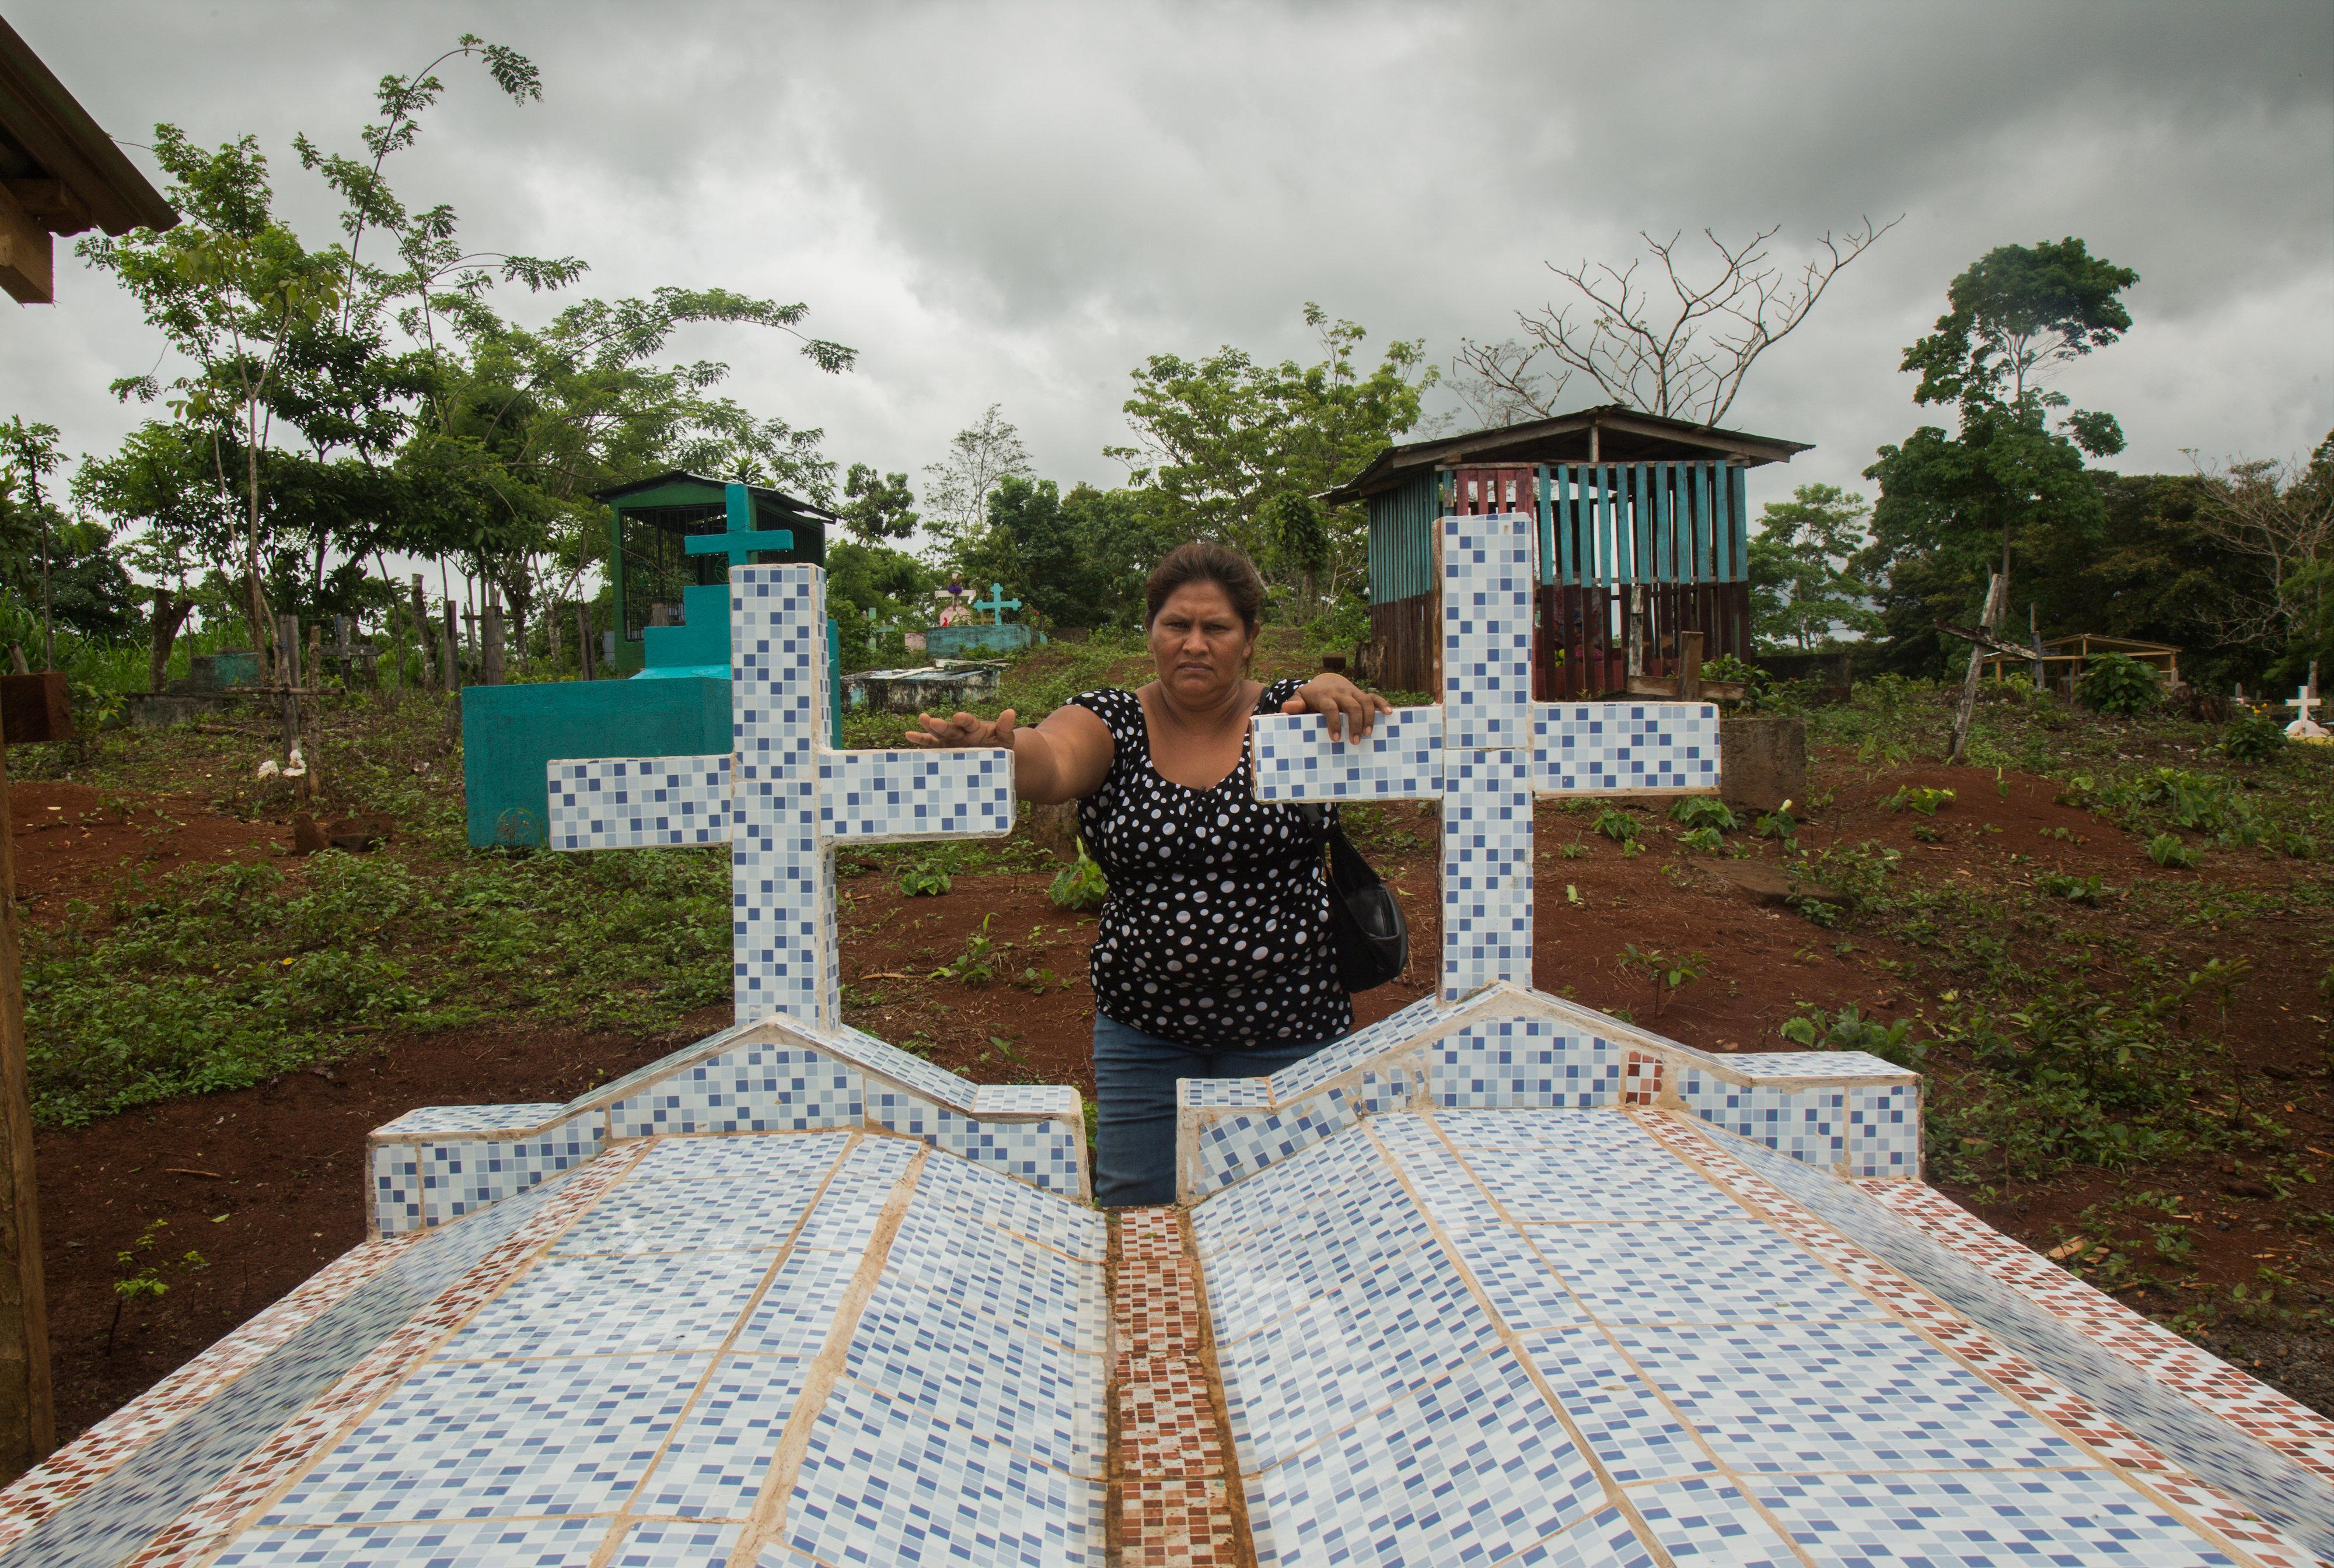 Francisca Ramirez visits her family cemetery in La Fonseca, Nicaragua. (Tom Laffay / Amnesty International)